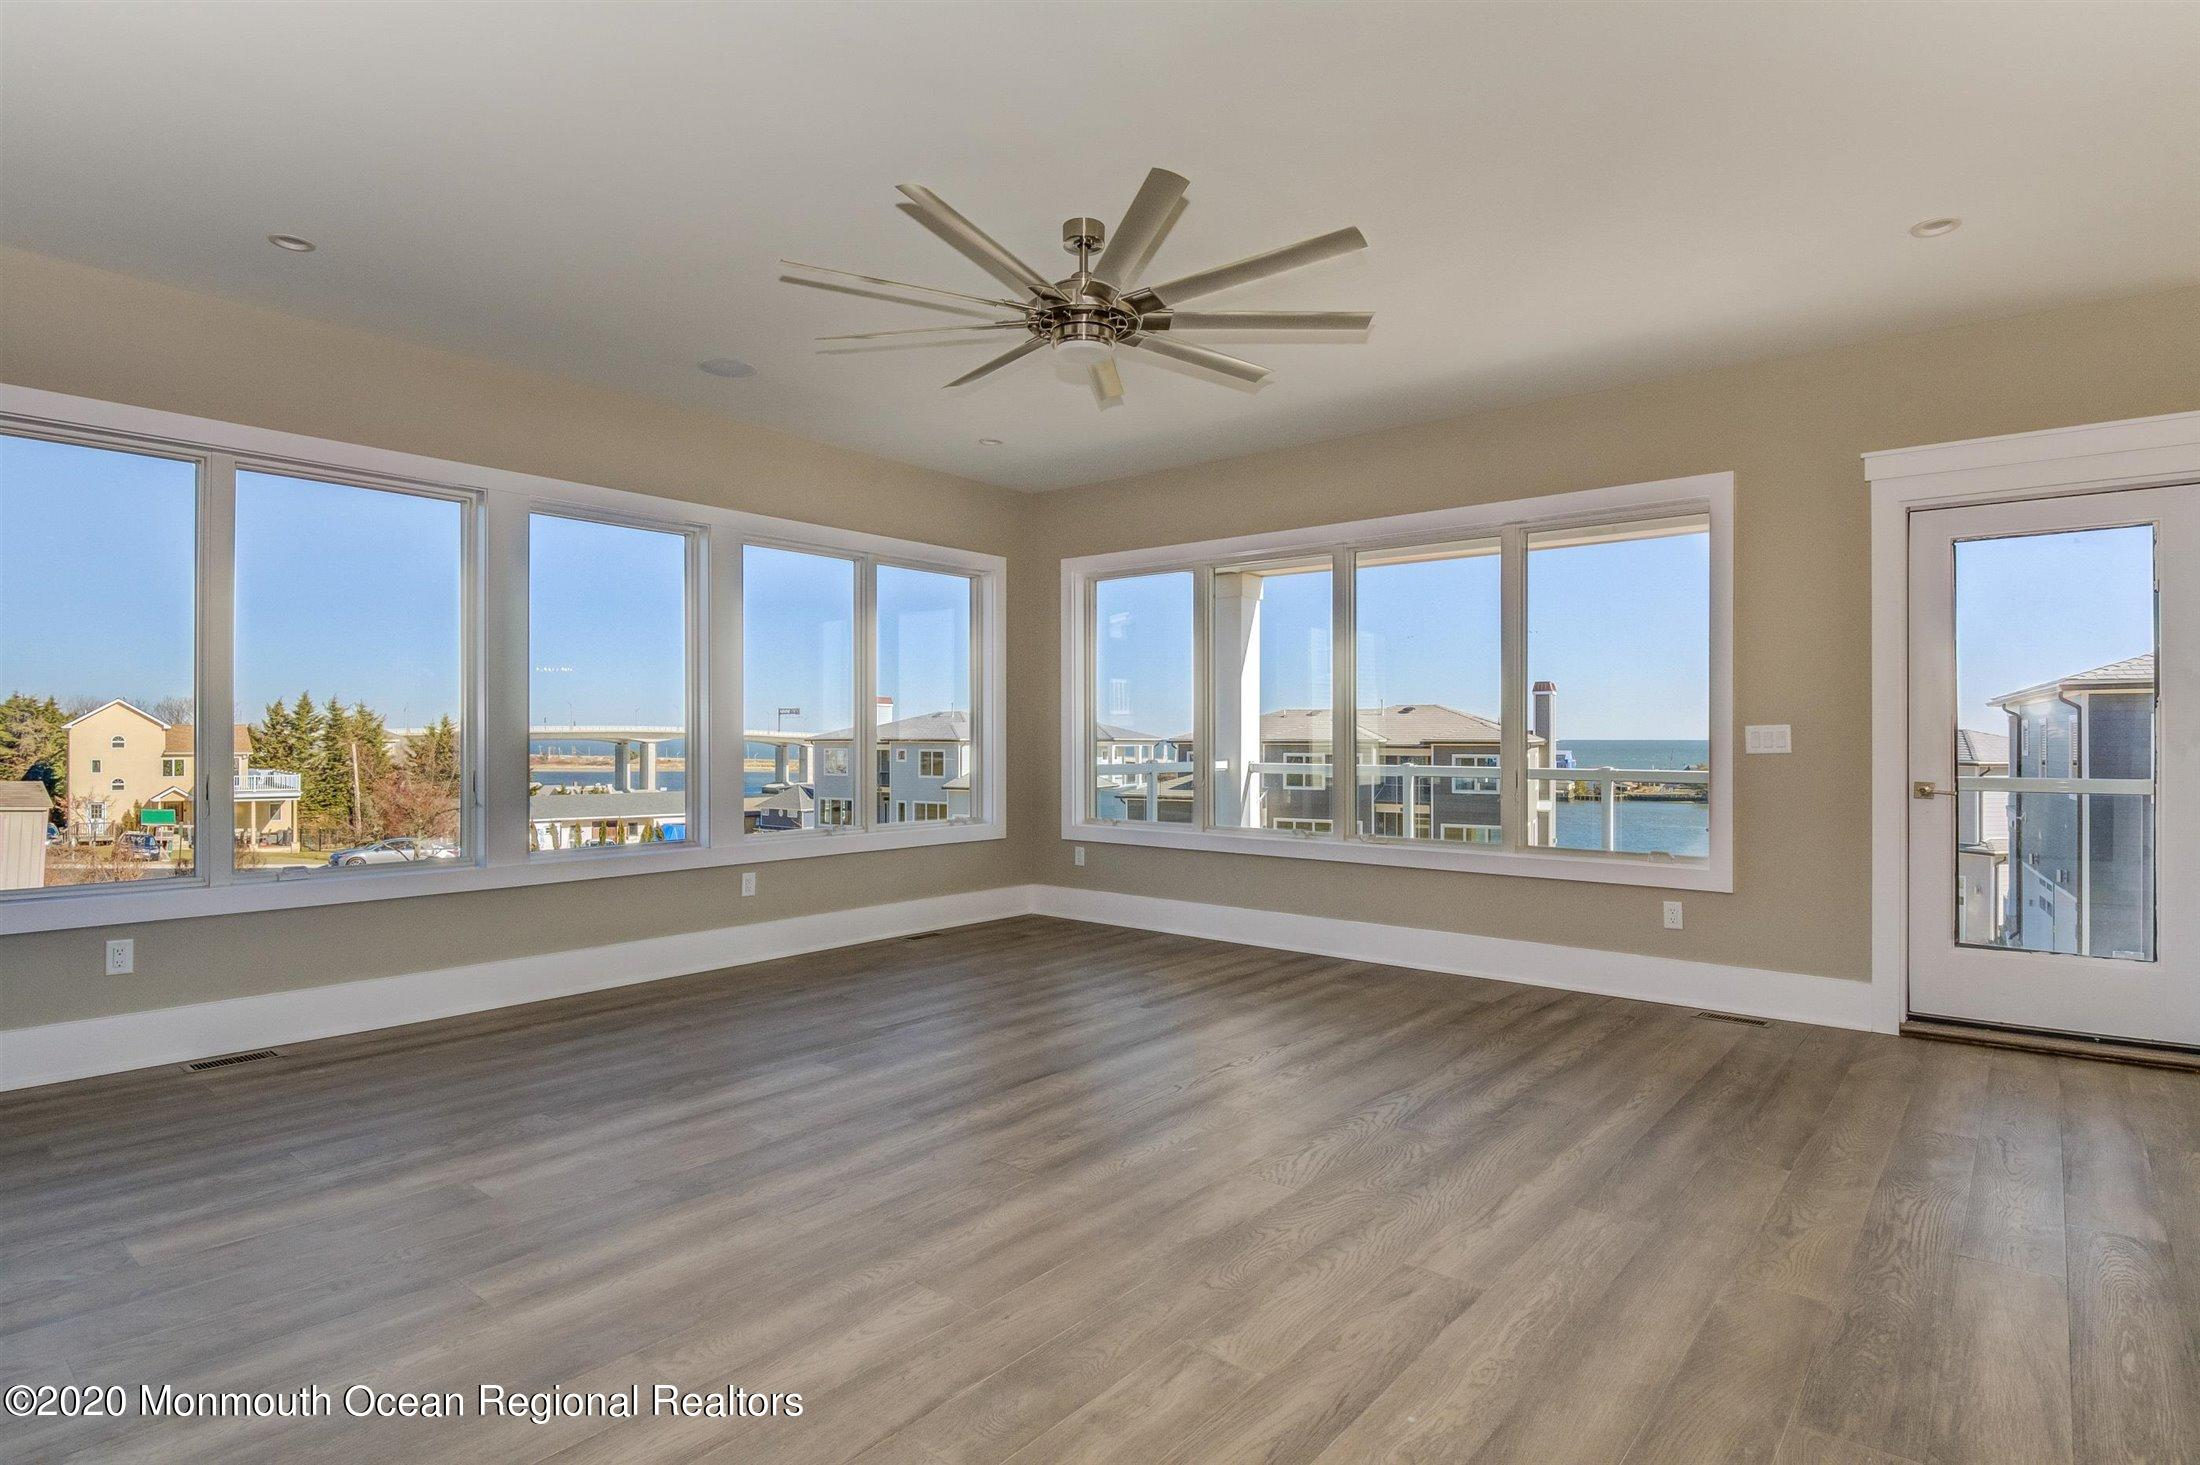 88-1 Portland Road, Highlands, New Jersey 07732, 5 Bedrooms Bedrooms, ,3 BathroomsBathrooms,Single Family,For Sale,88-1 Portland Road,3,22108684